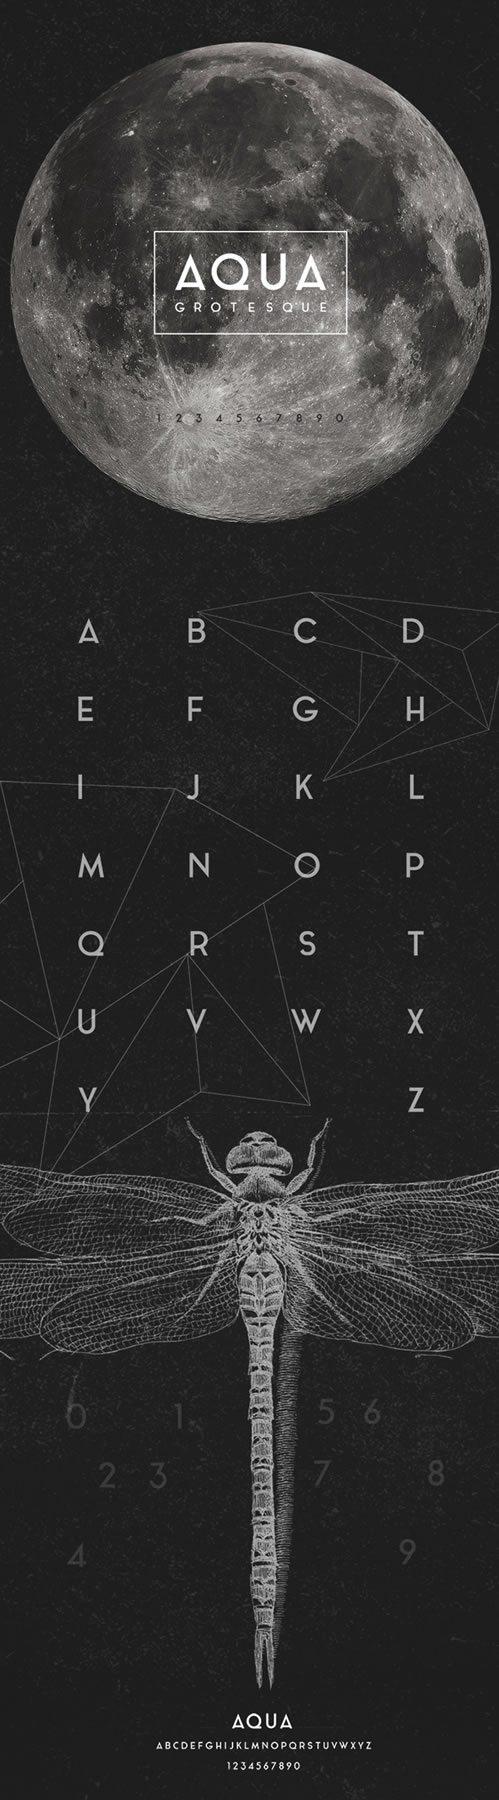 ffonts055 top 100 dei font gratuti del 2015 da avere assolutamente